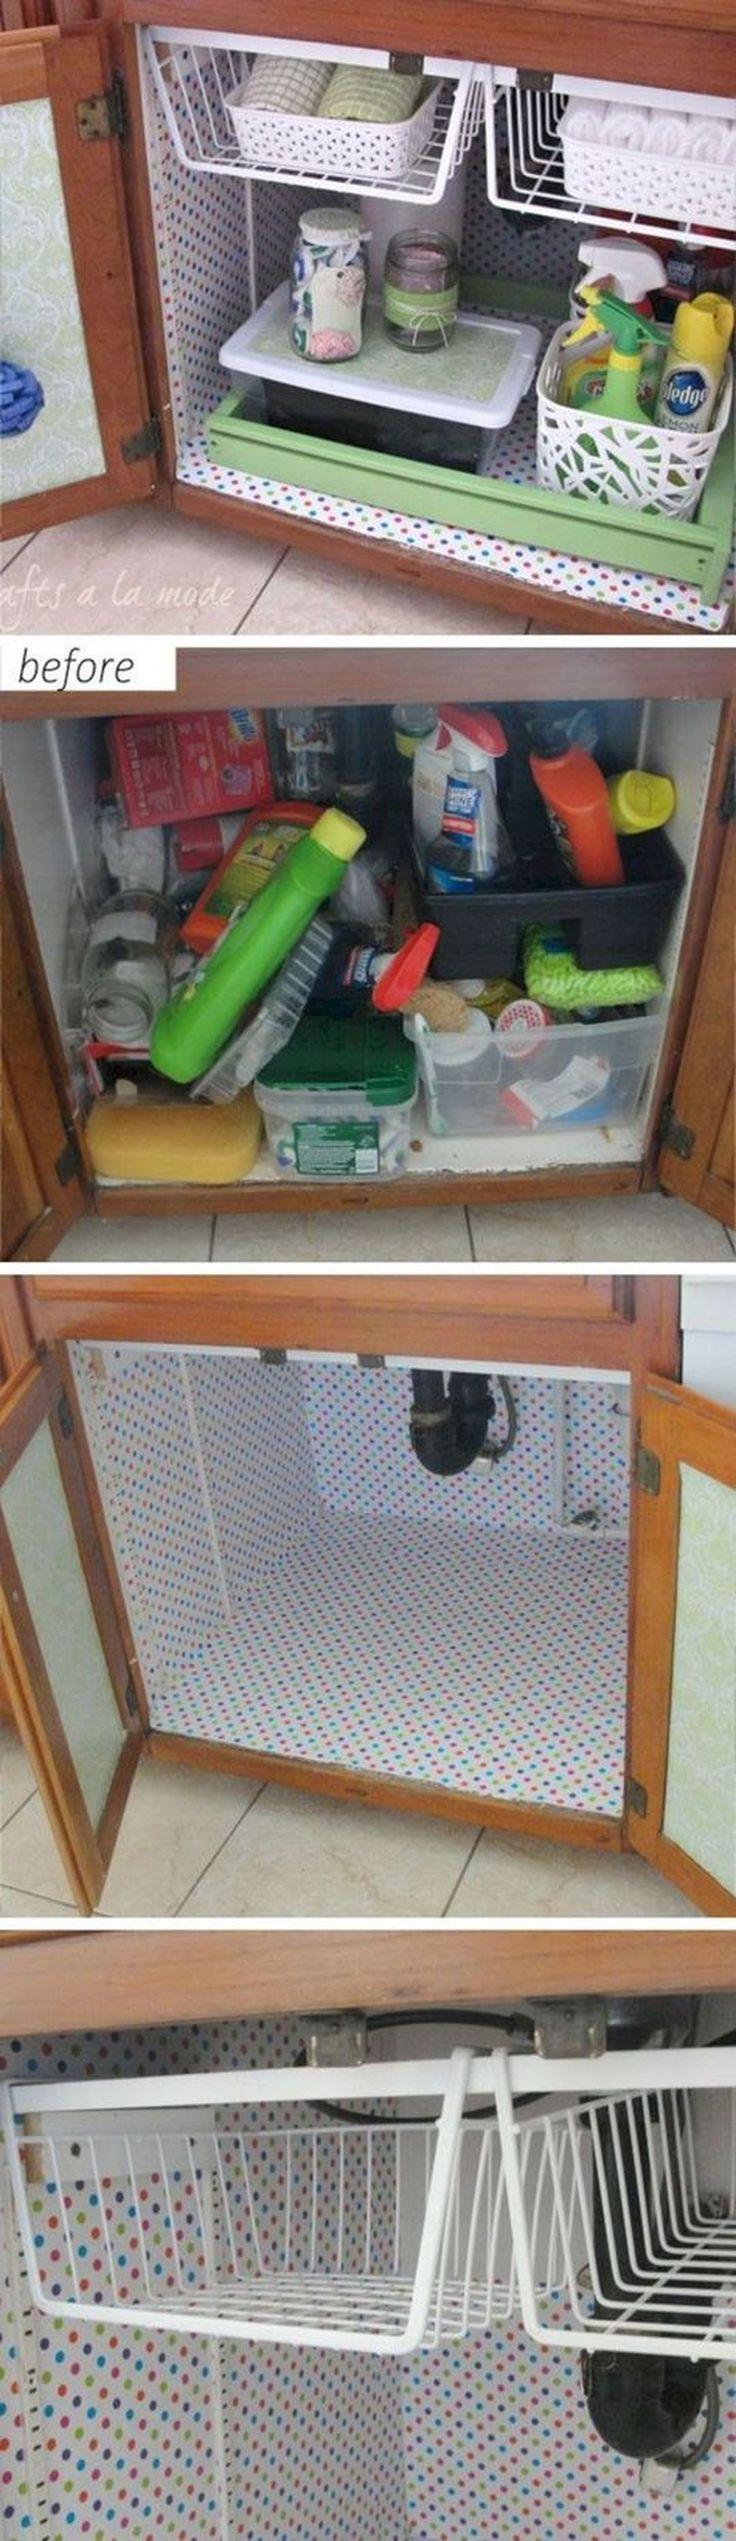 62 aliner camper interior storage modifications